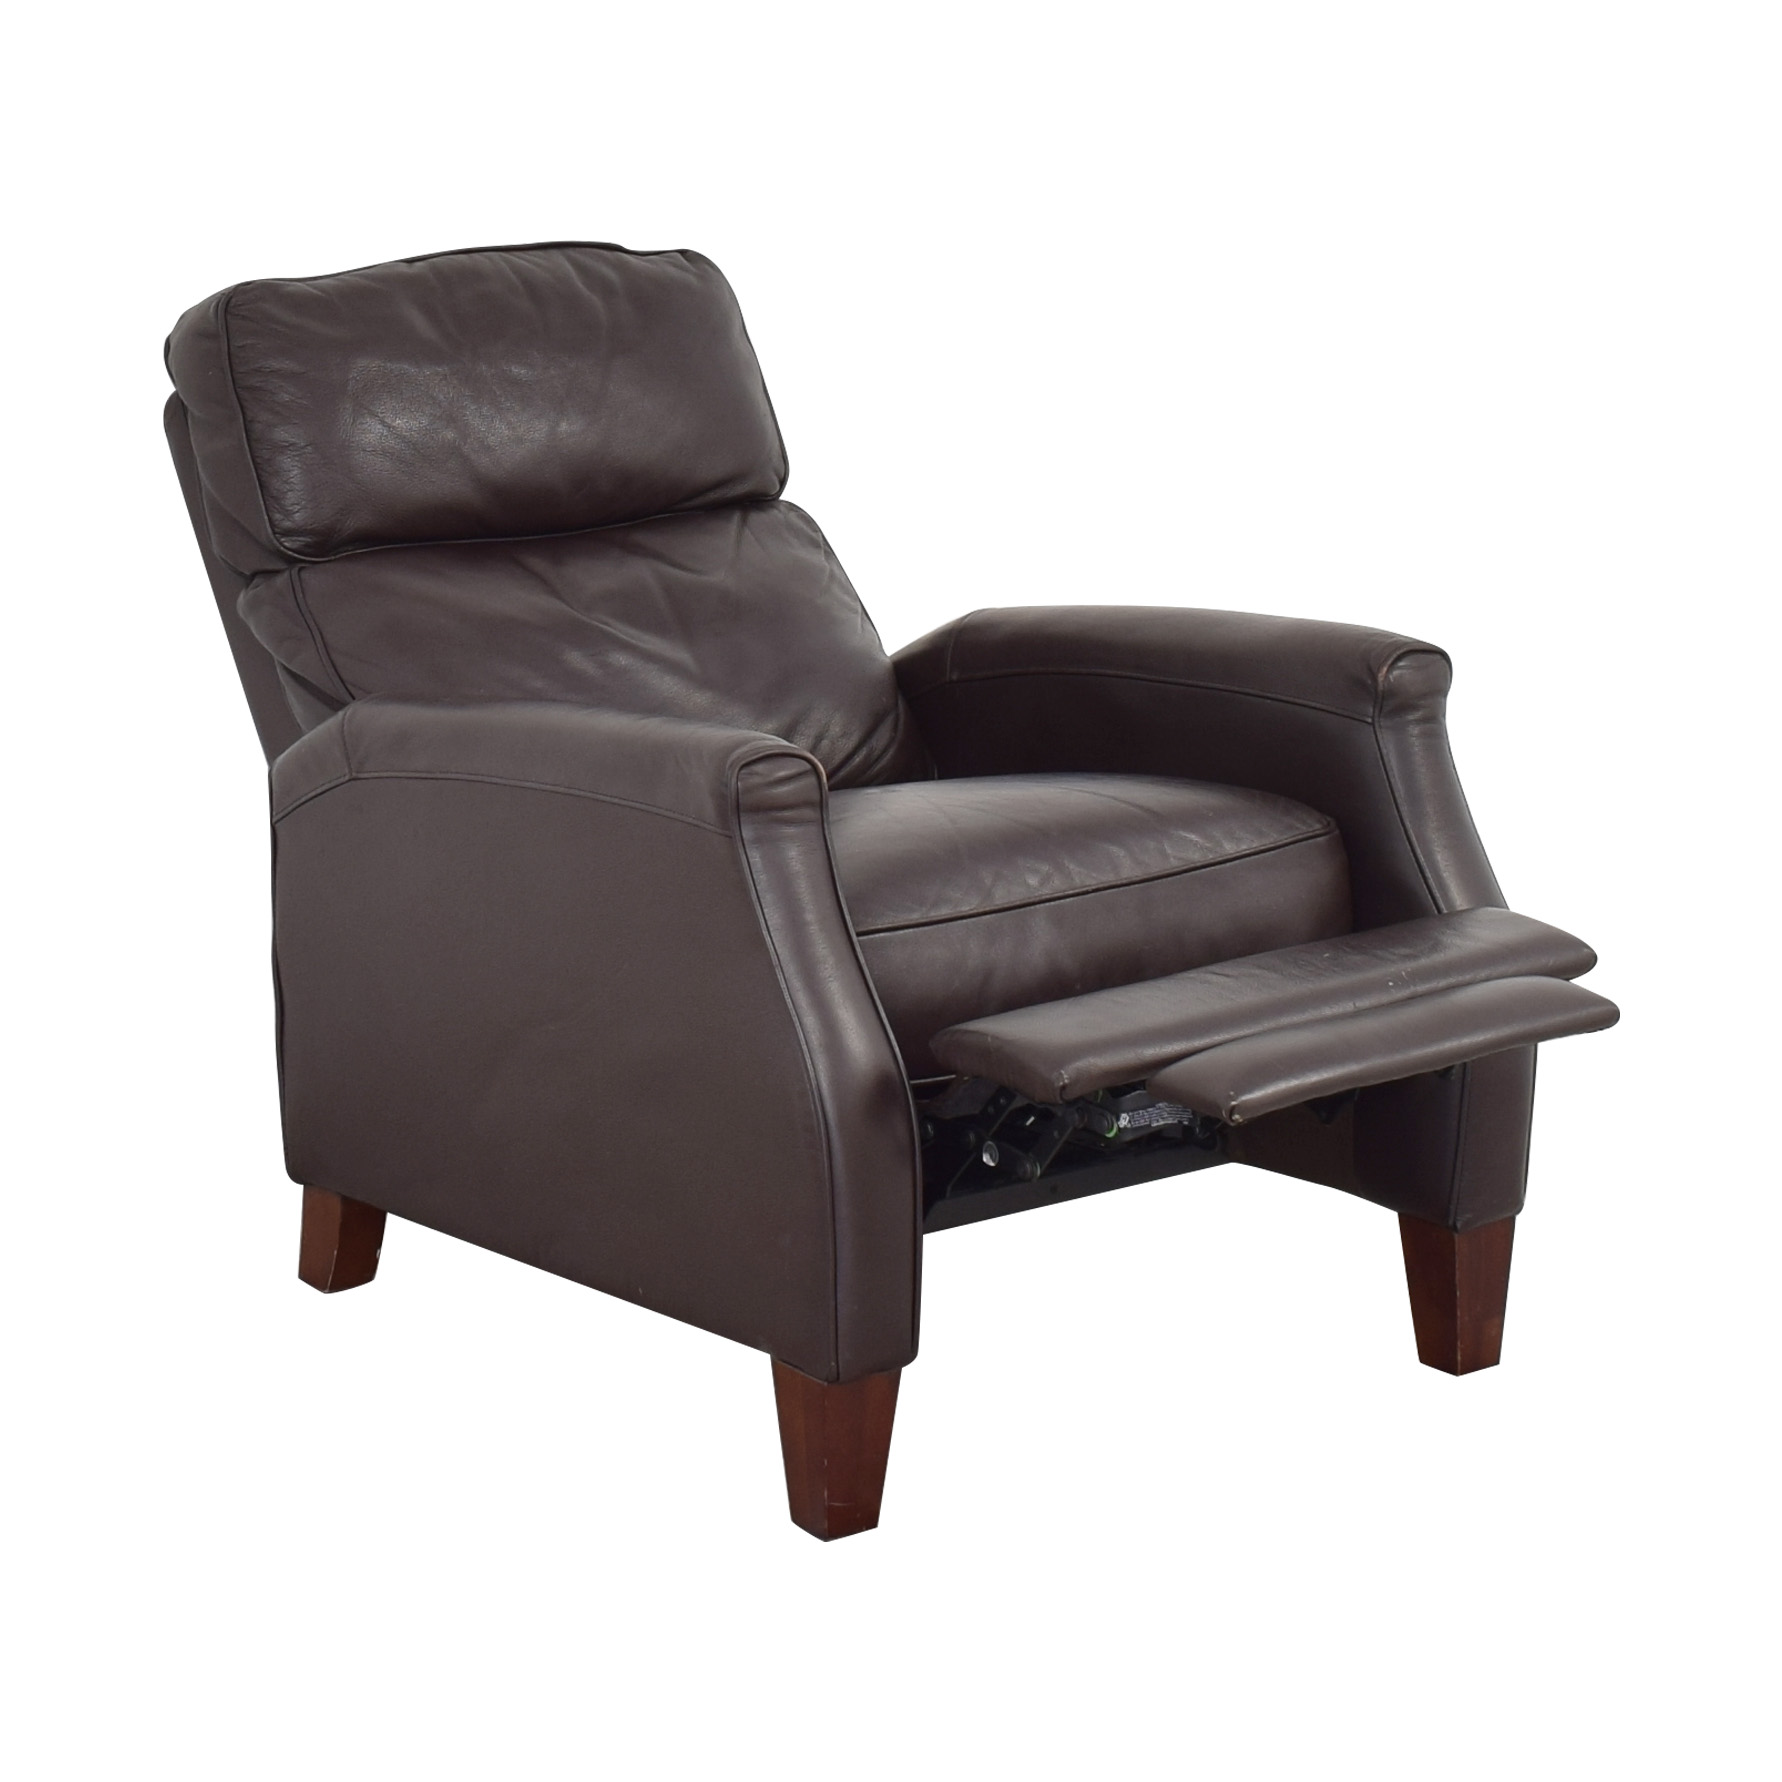 Macy's Macy's Leather Recliner Armchair discount